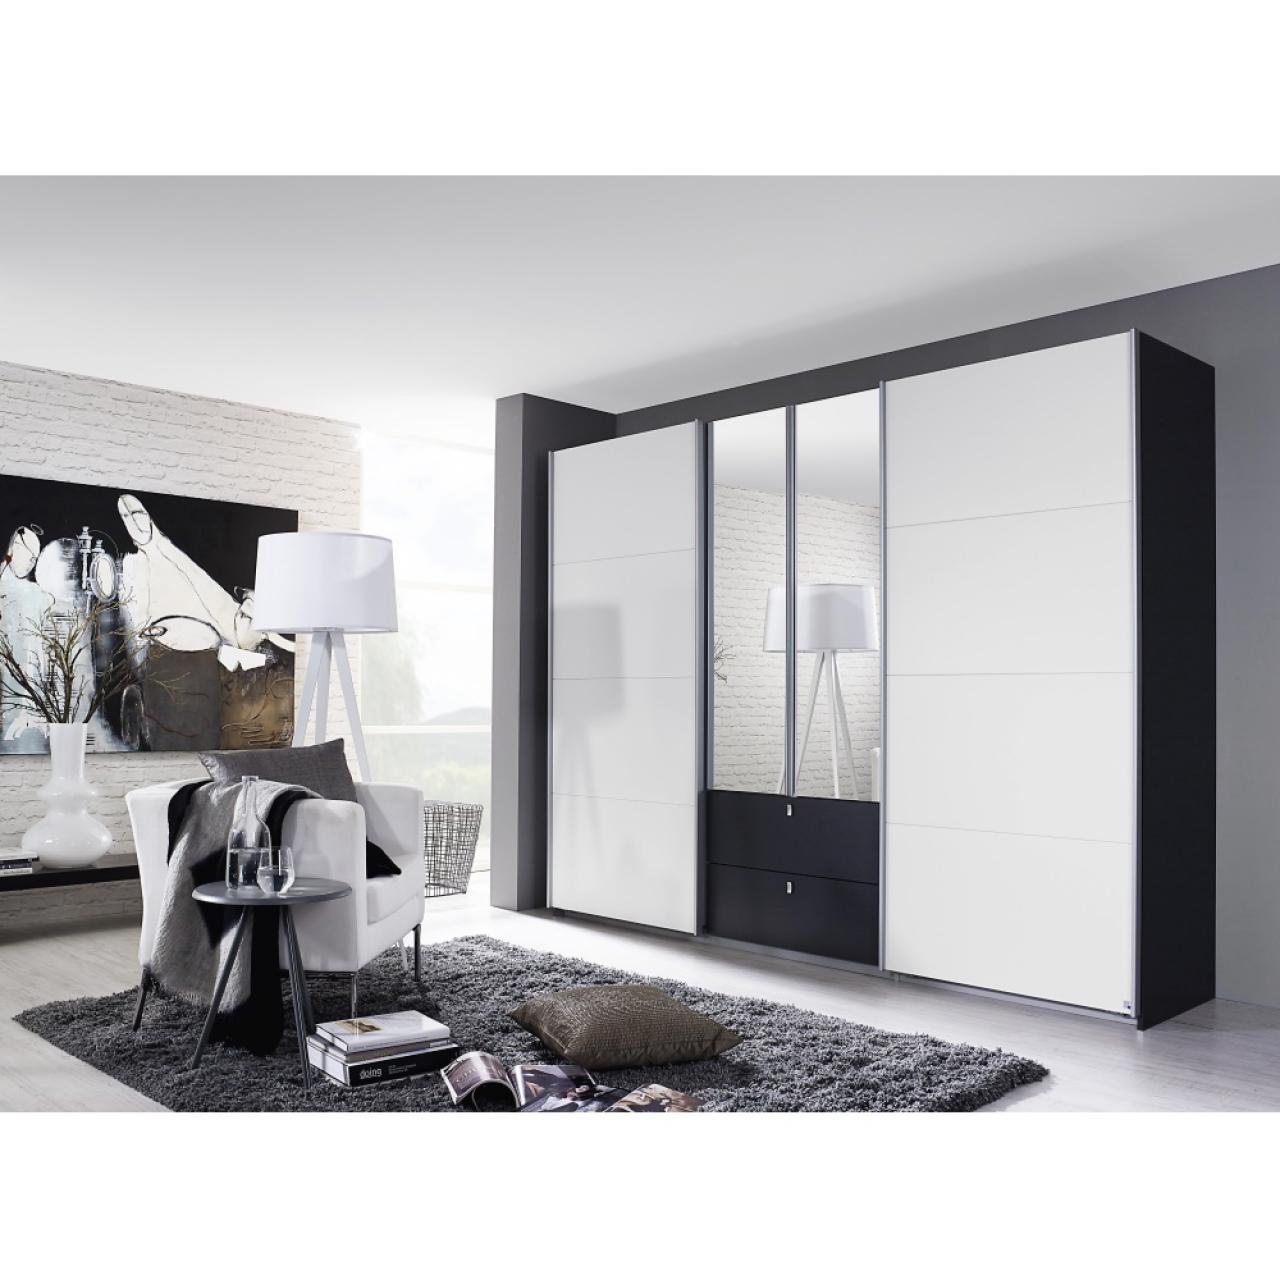 Kombischwebetürenschrank - Kombino - Weiß / Grau